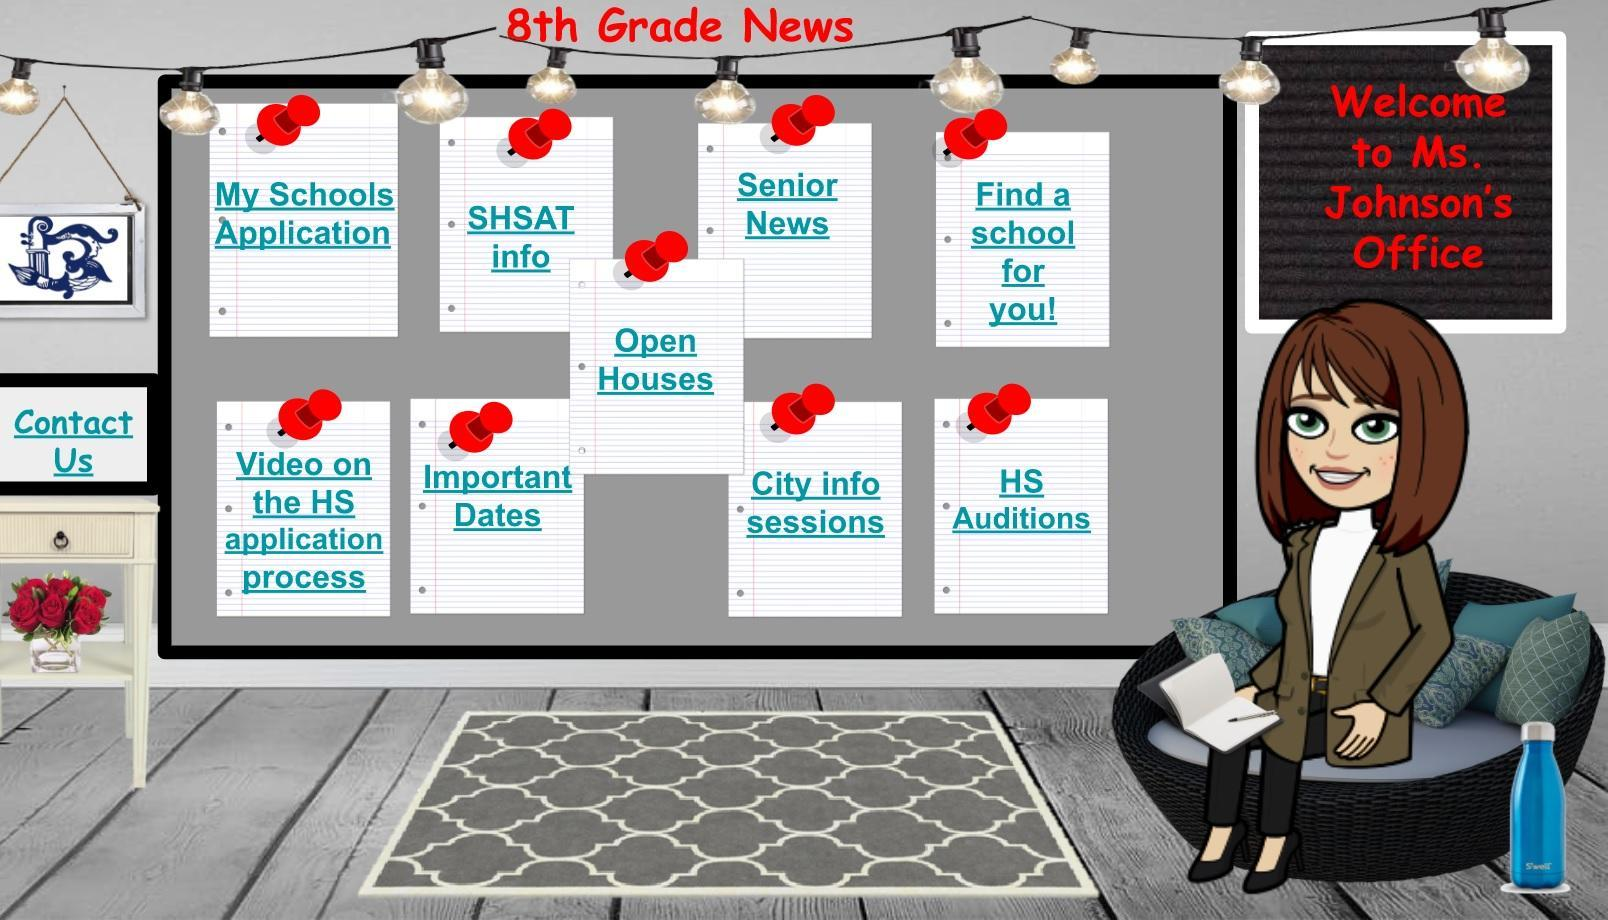 8th Grade Virtual Office